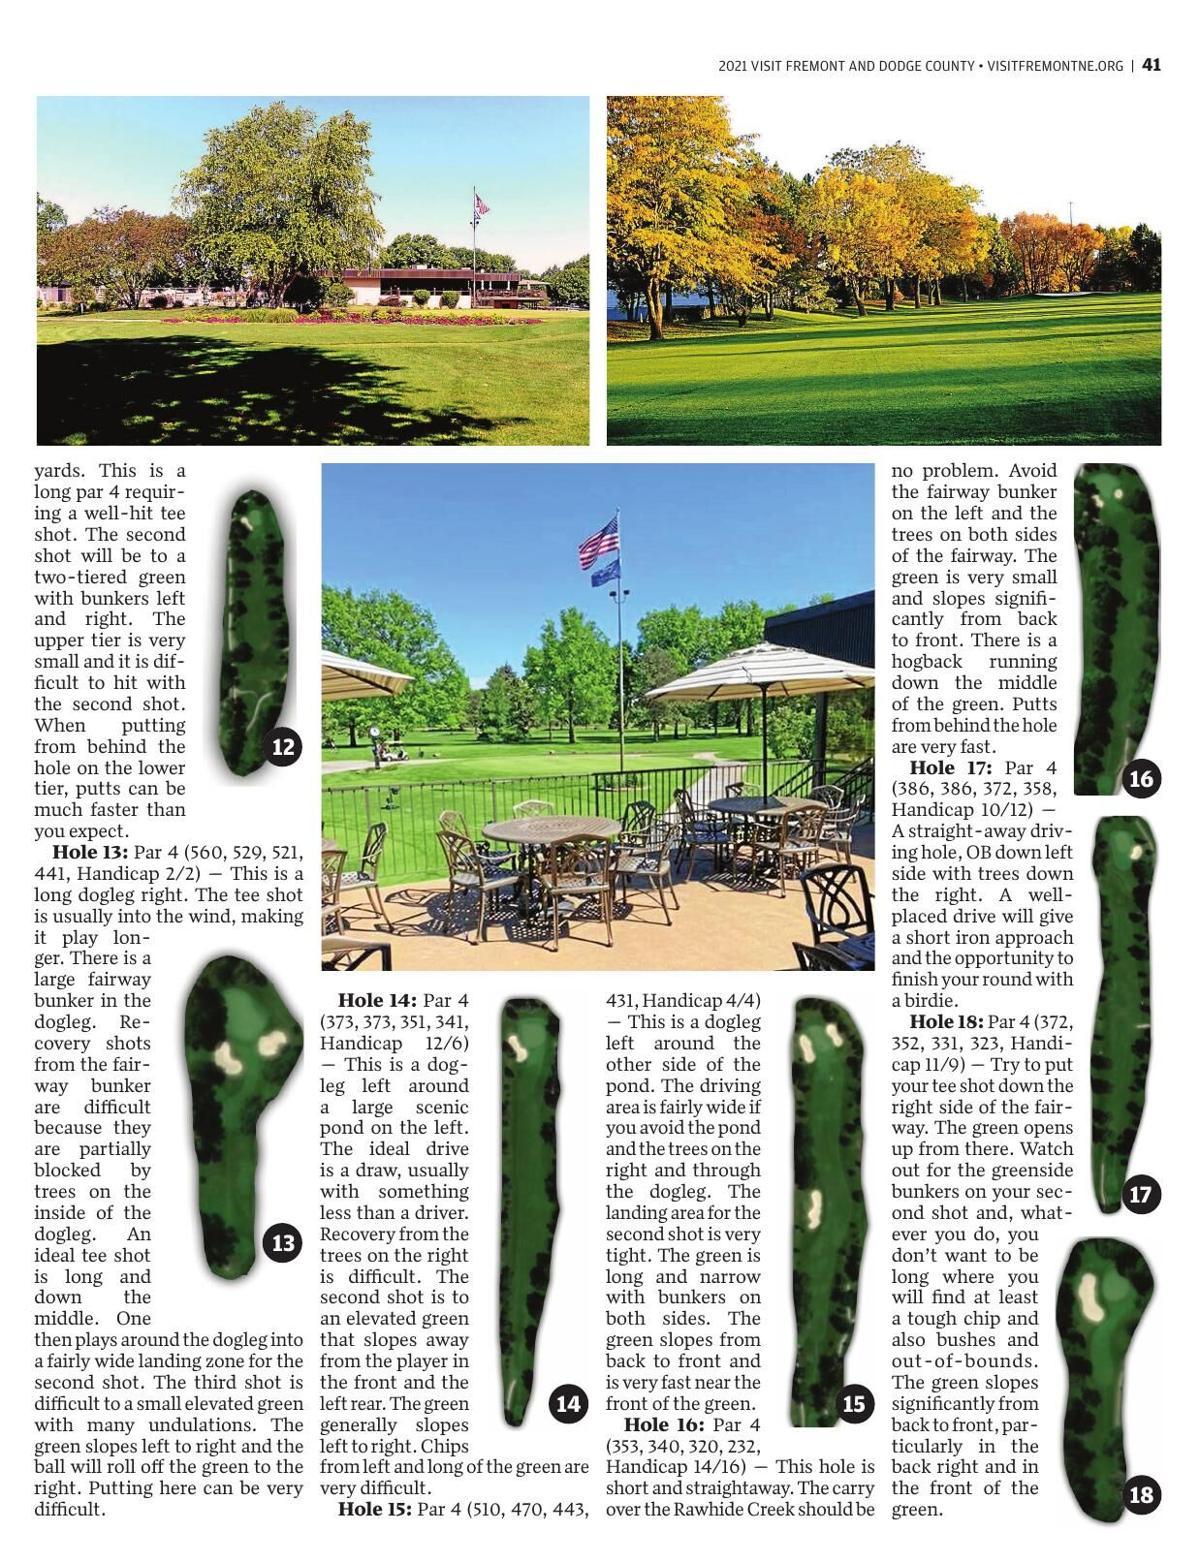 Visit Fremont and Dodge County 2021 41.pdf